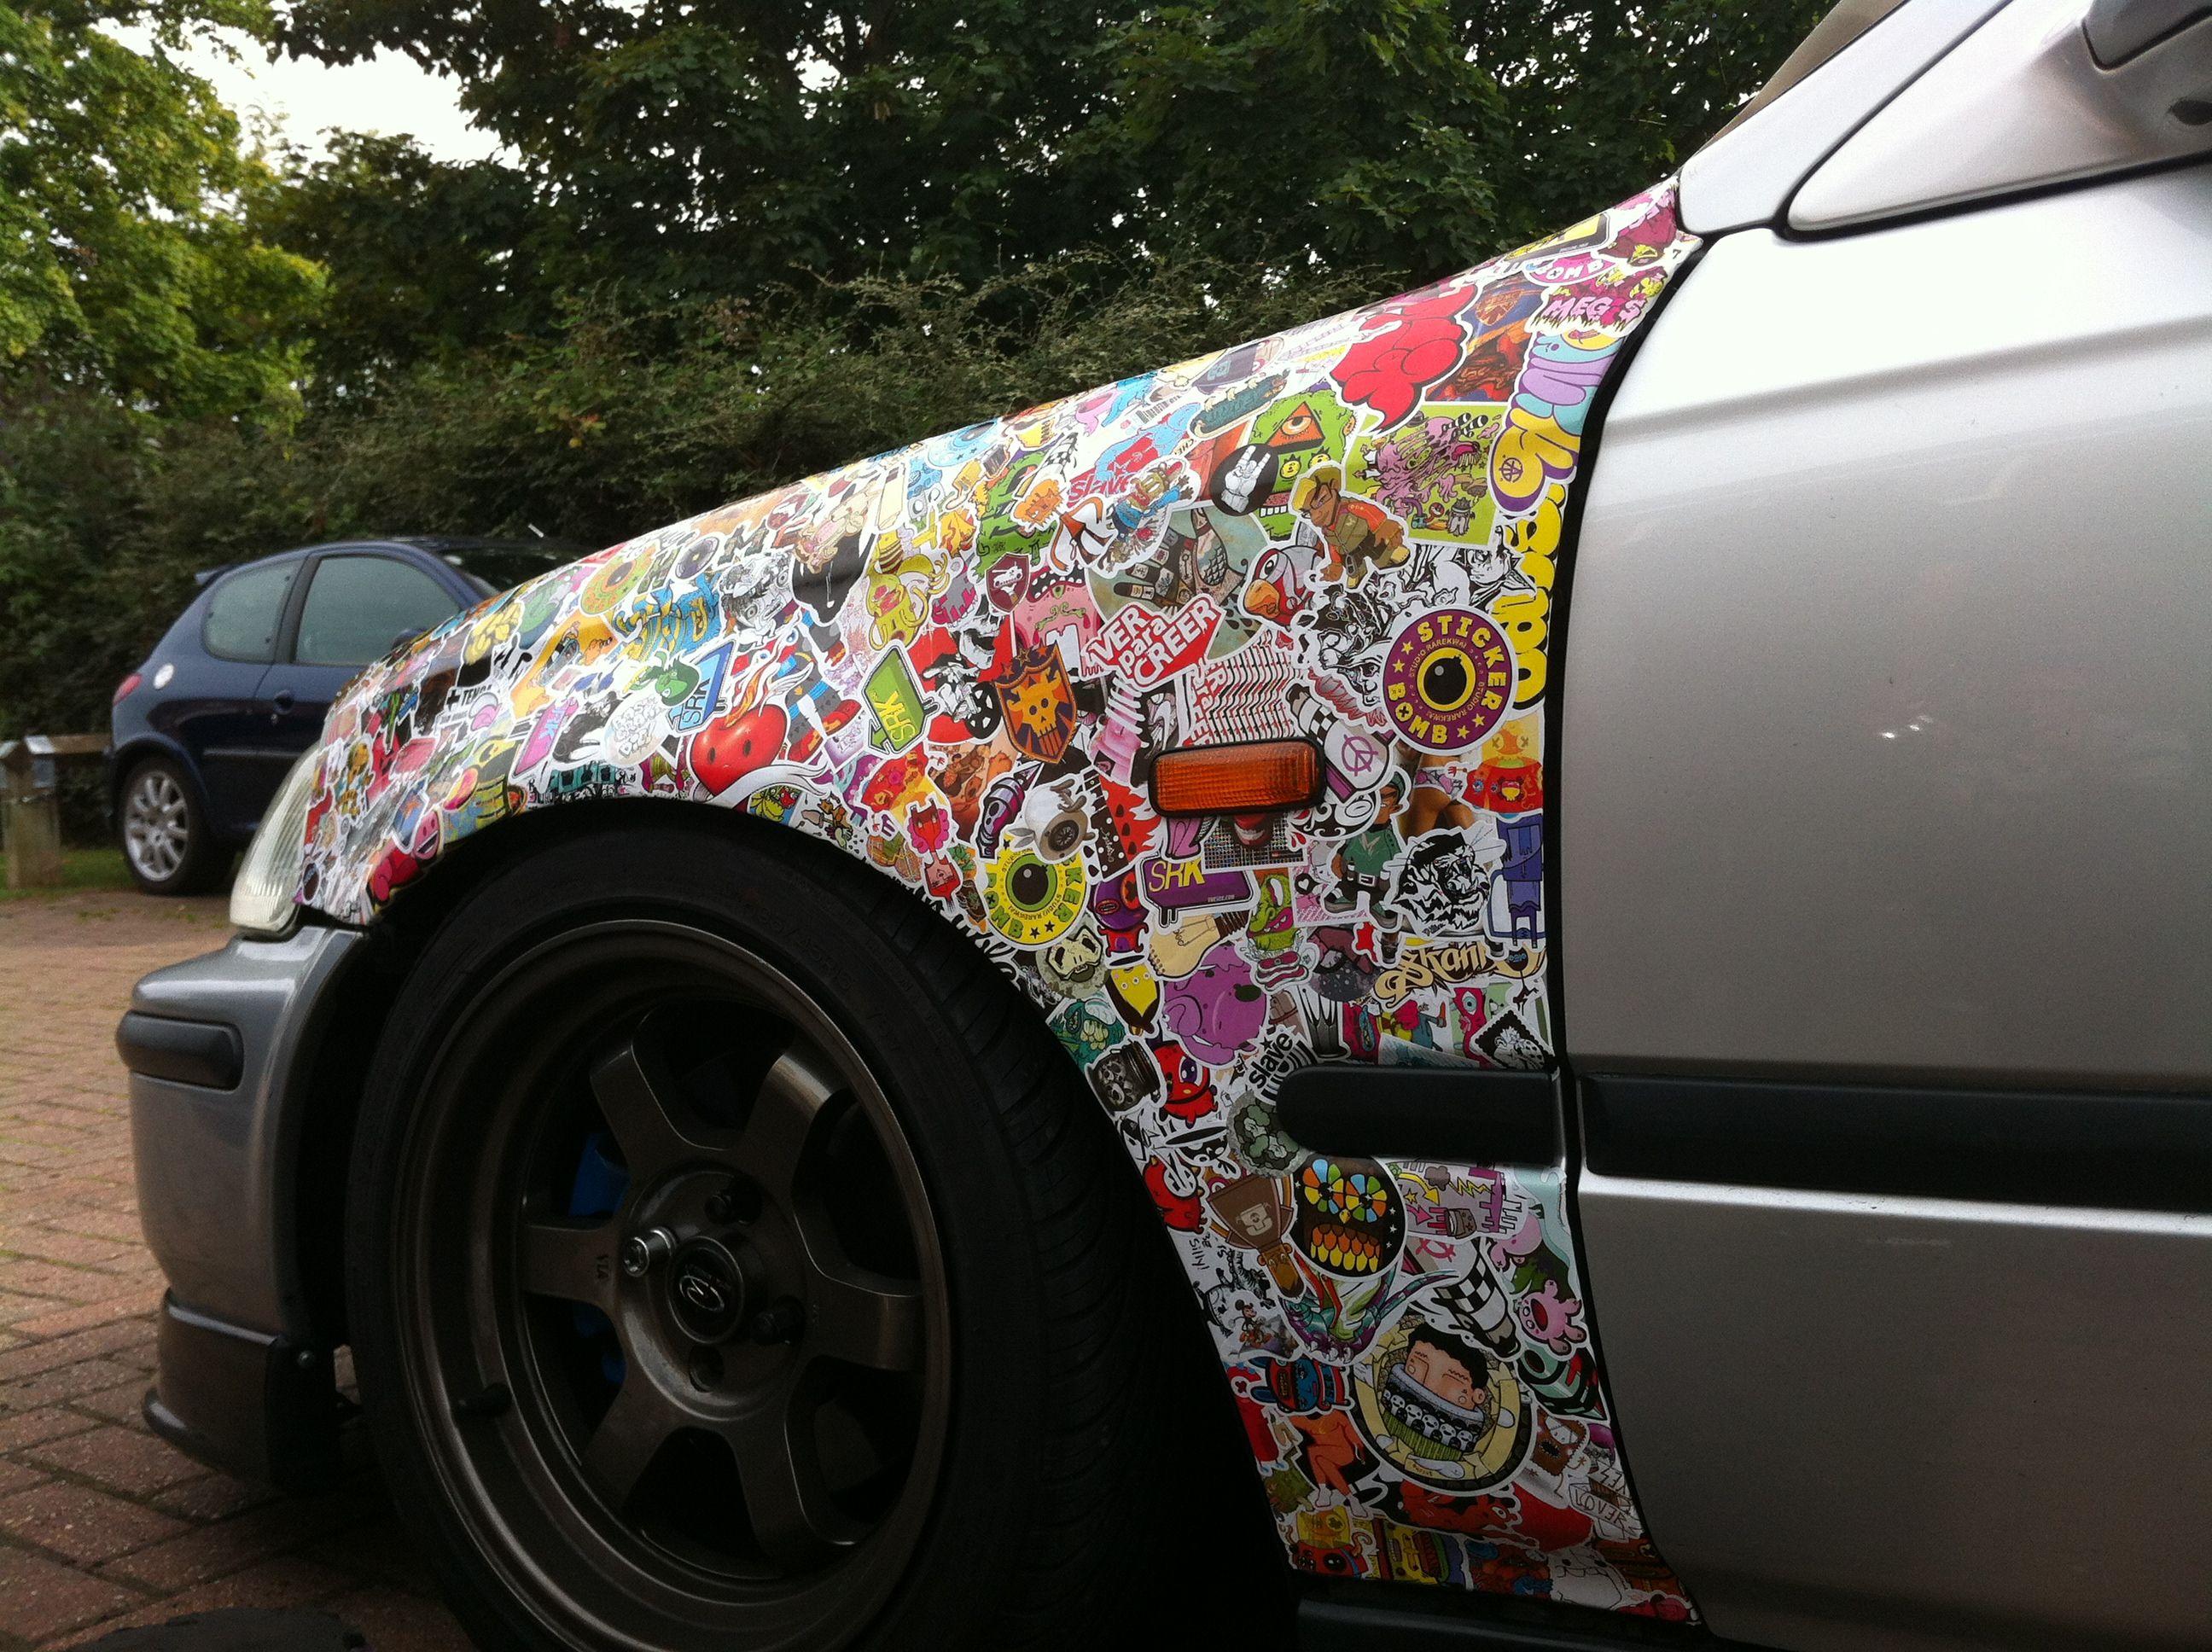 Sticker bomb car design - Sticker Bomb